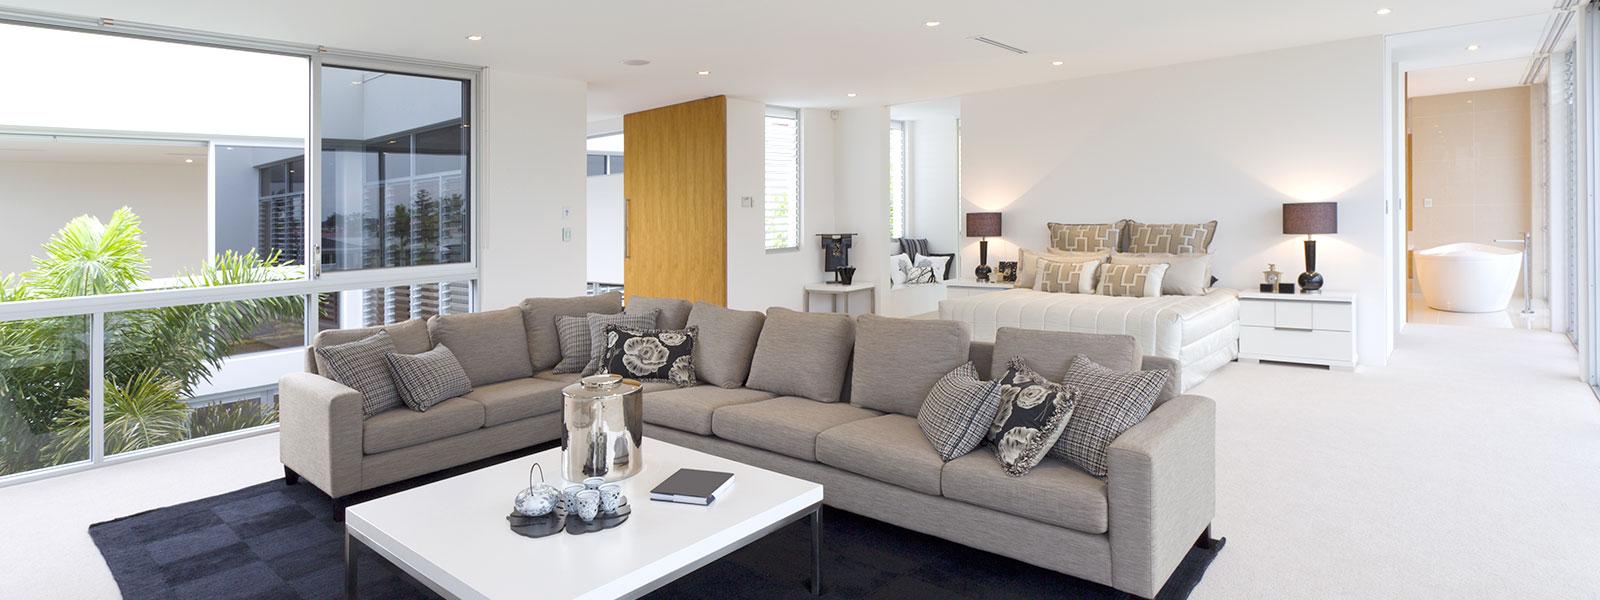 france verre fabrication et installation de menuiseries aluminium pvc dunkerque 59. Black Bedroom Furniture Sets. Home Design Ideas